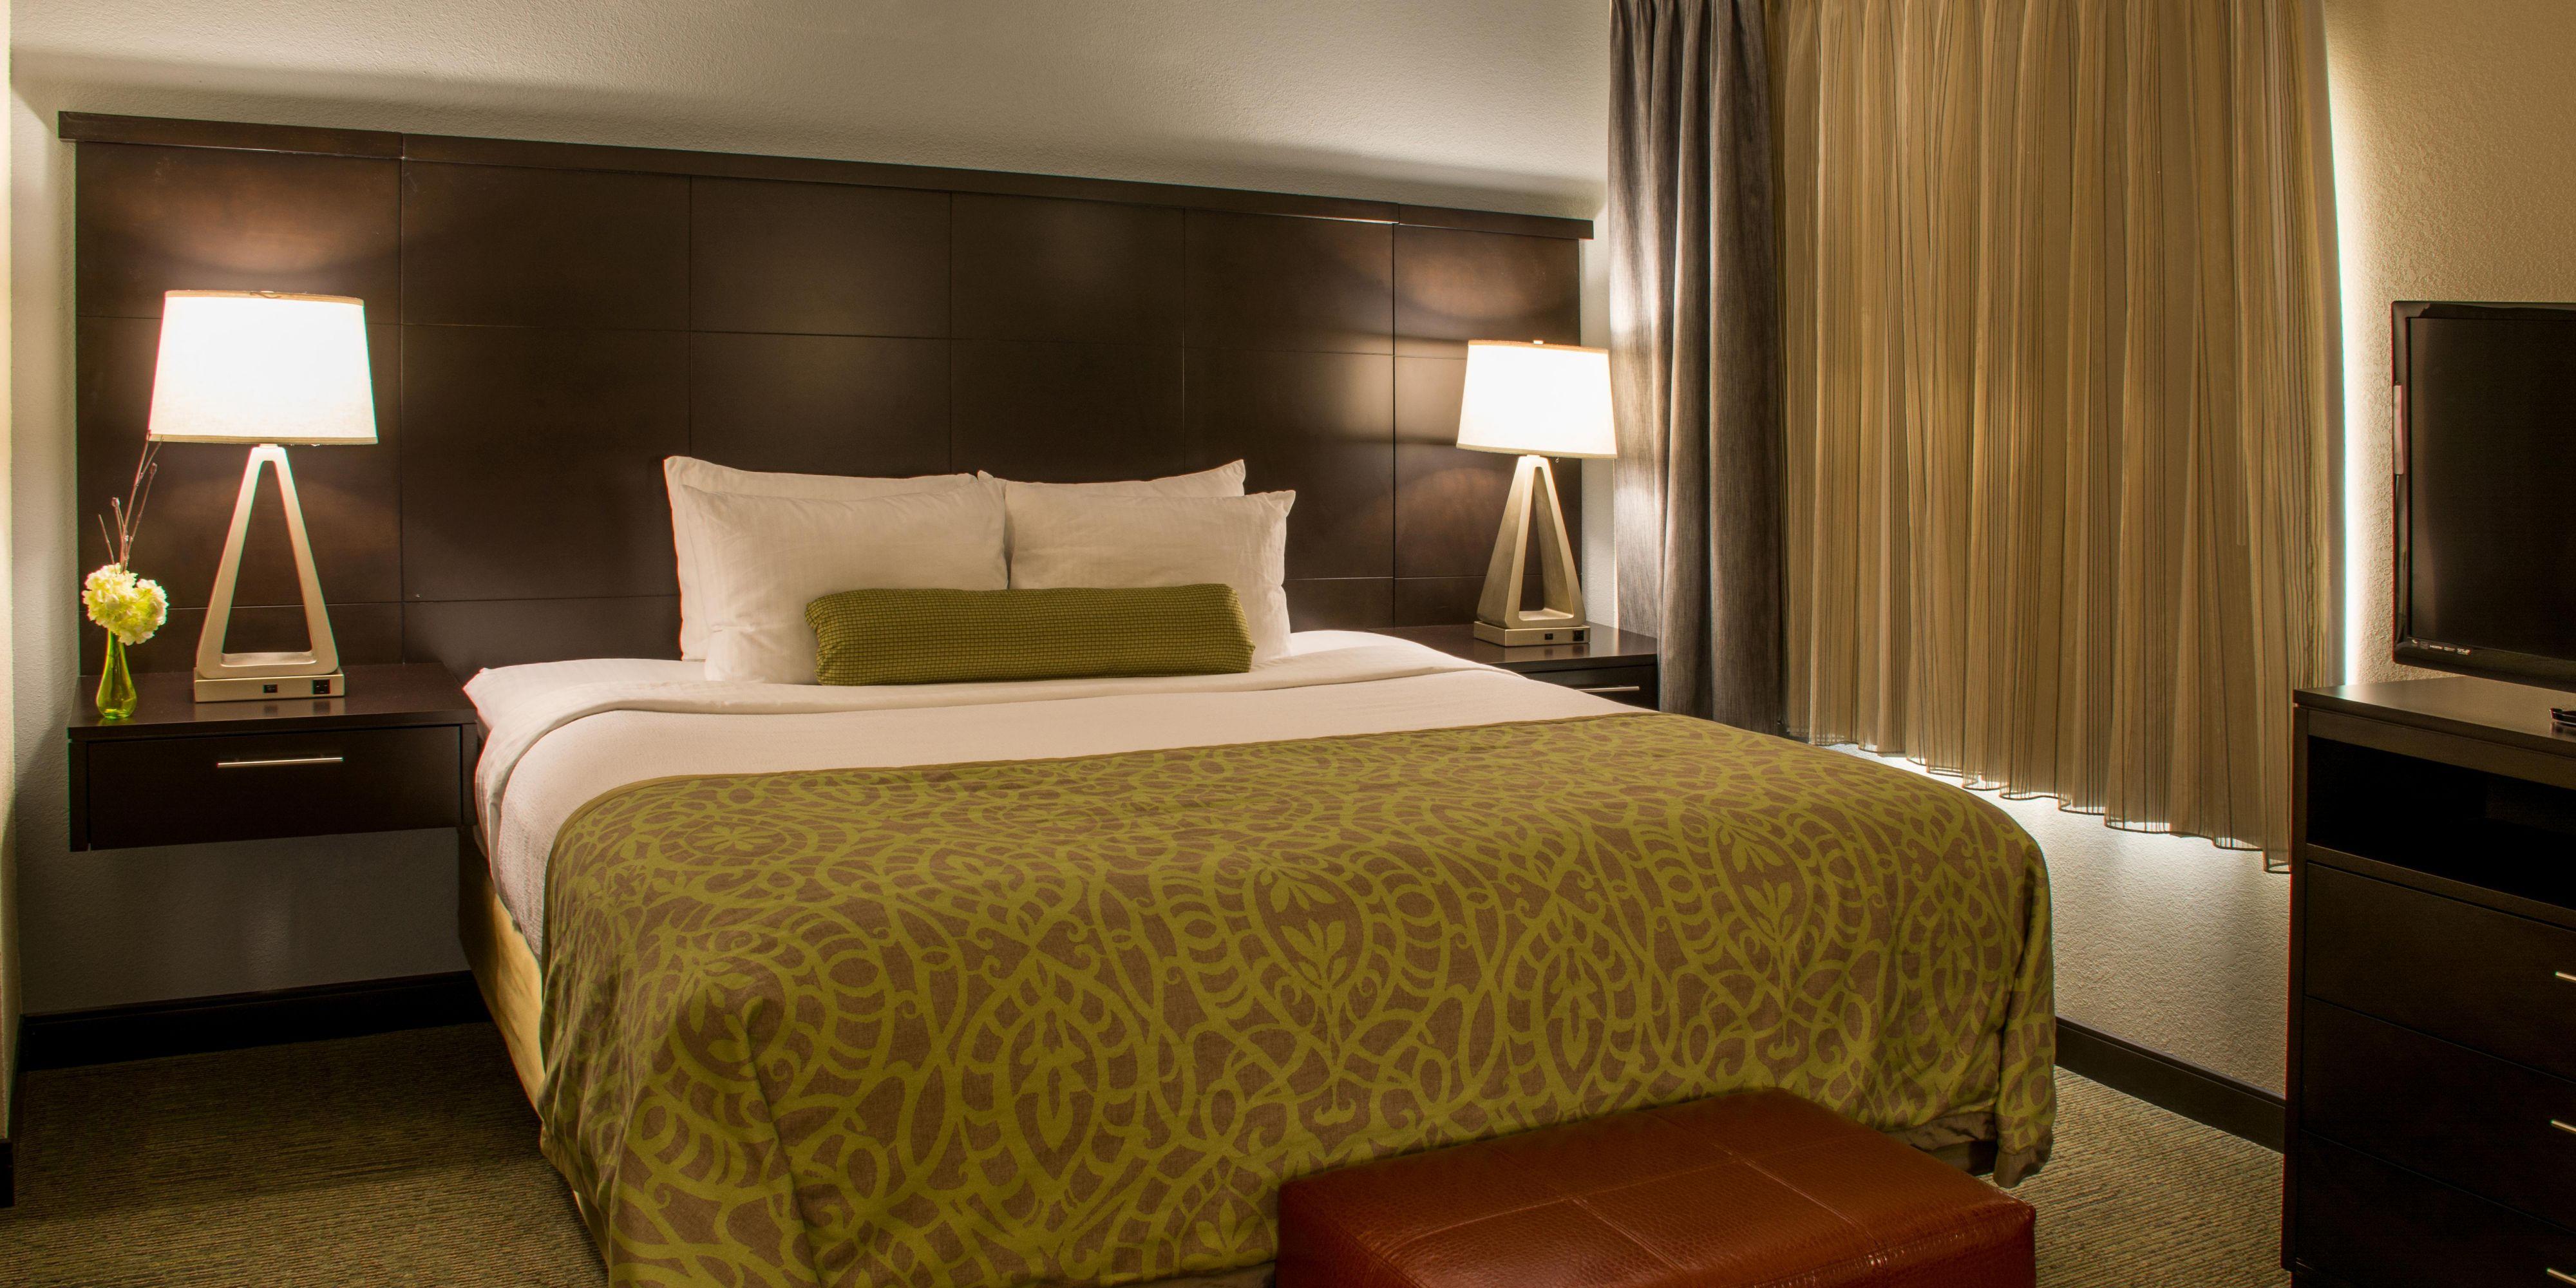 Hotels Near Schererville In